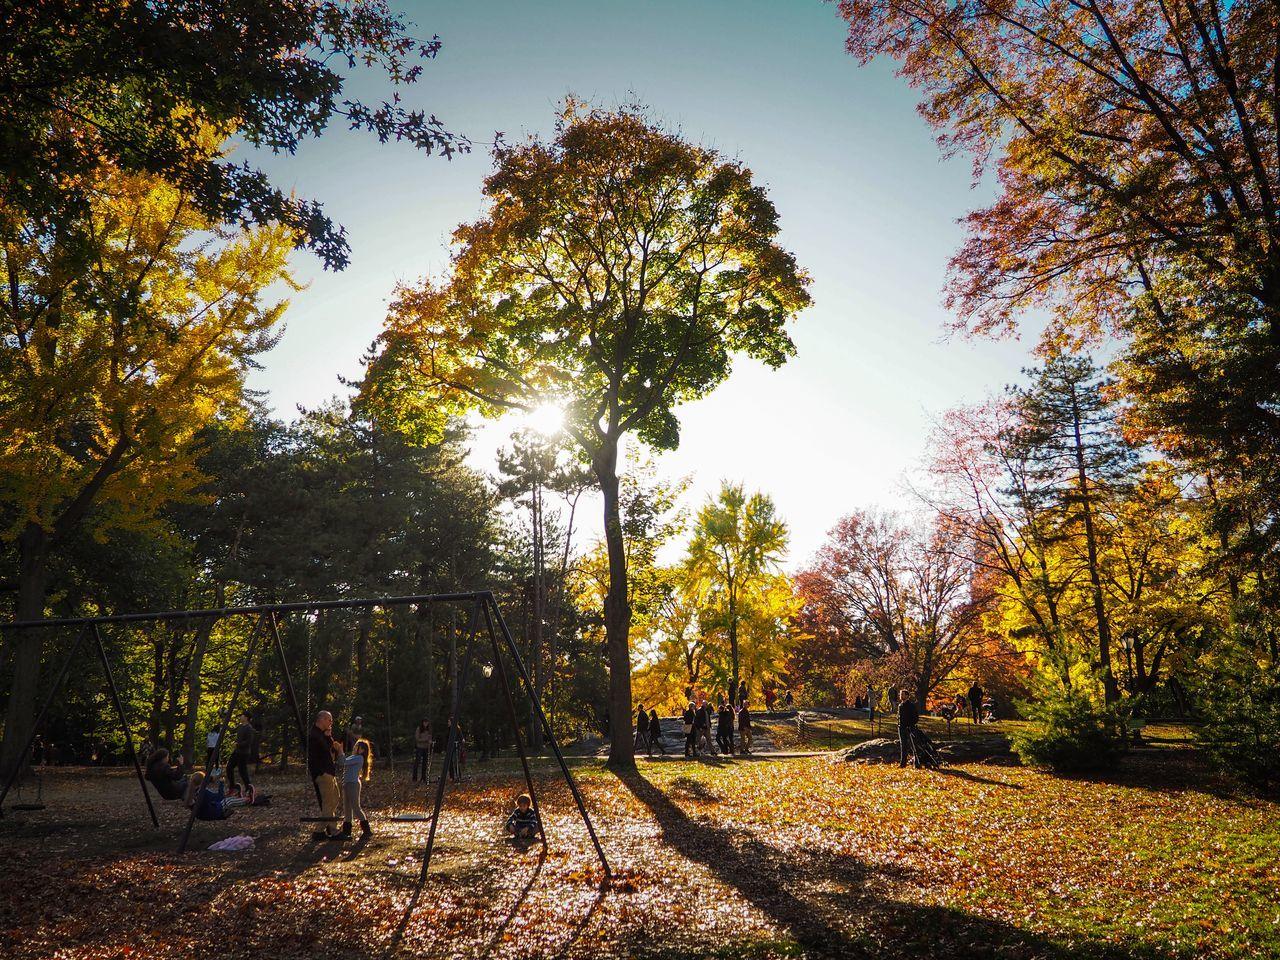 People Enjoying In Park During Autumn